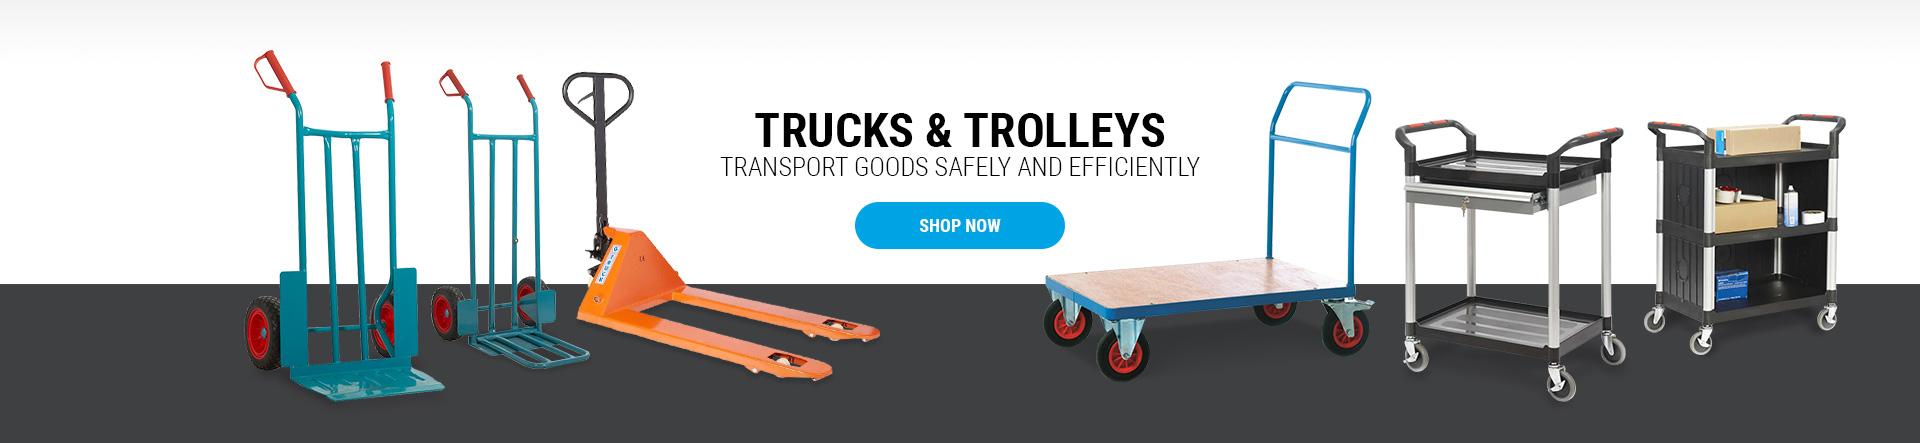 Trucks & Trolleys Splash